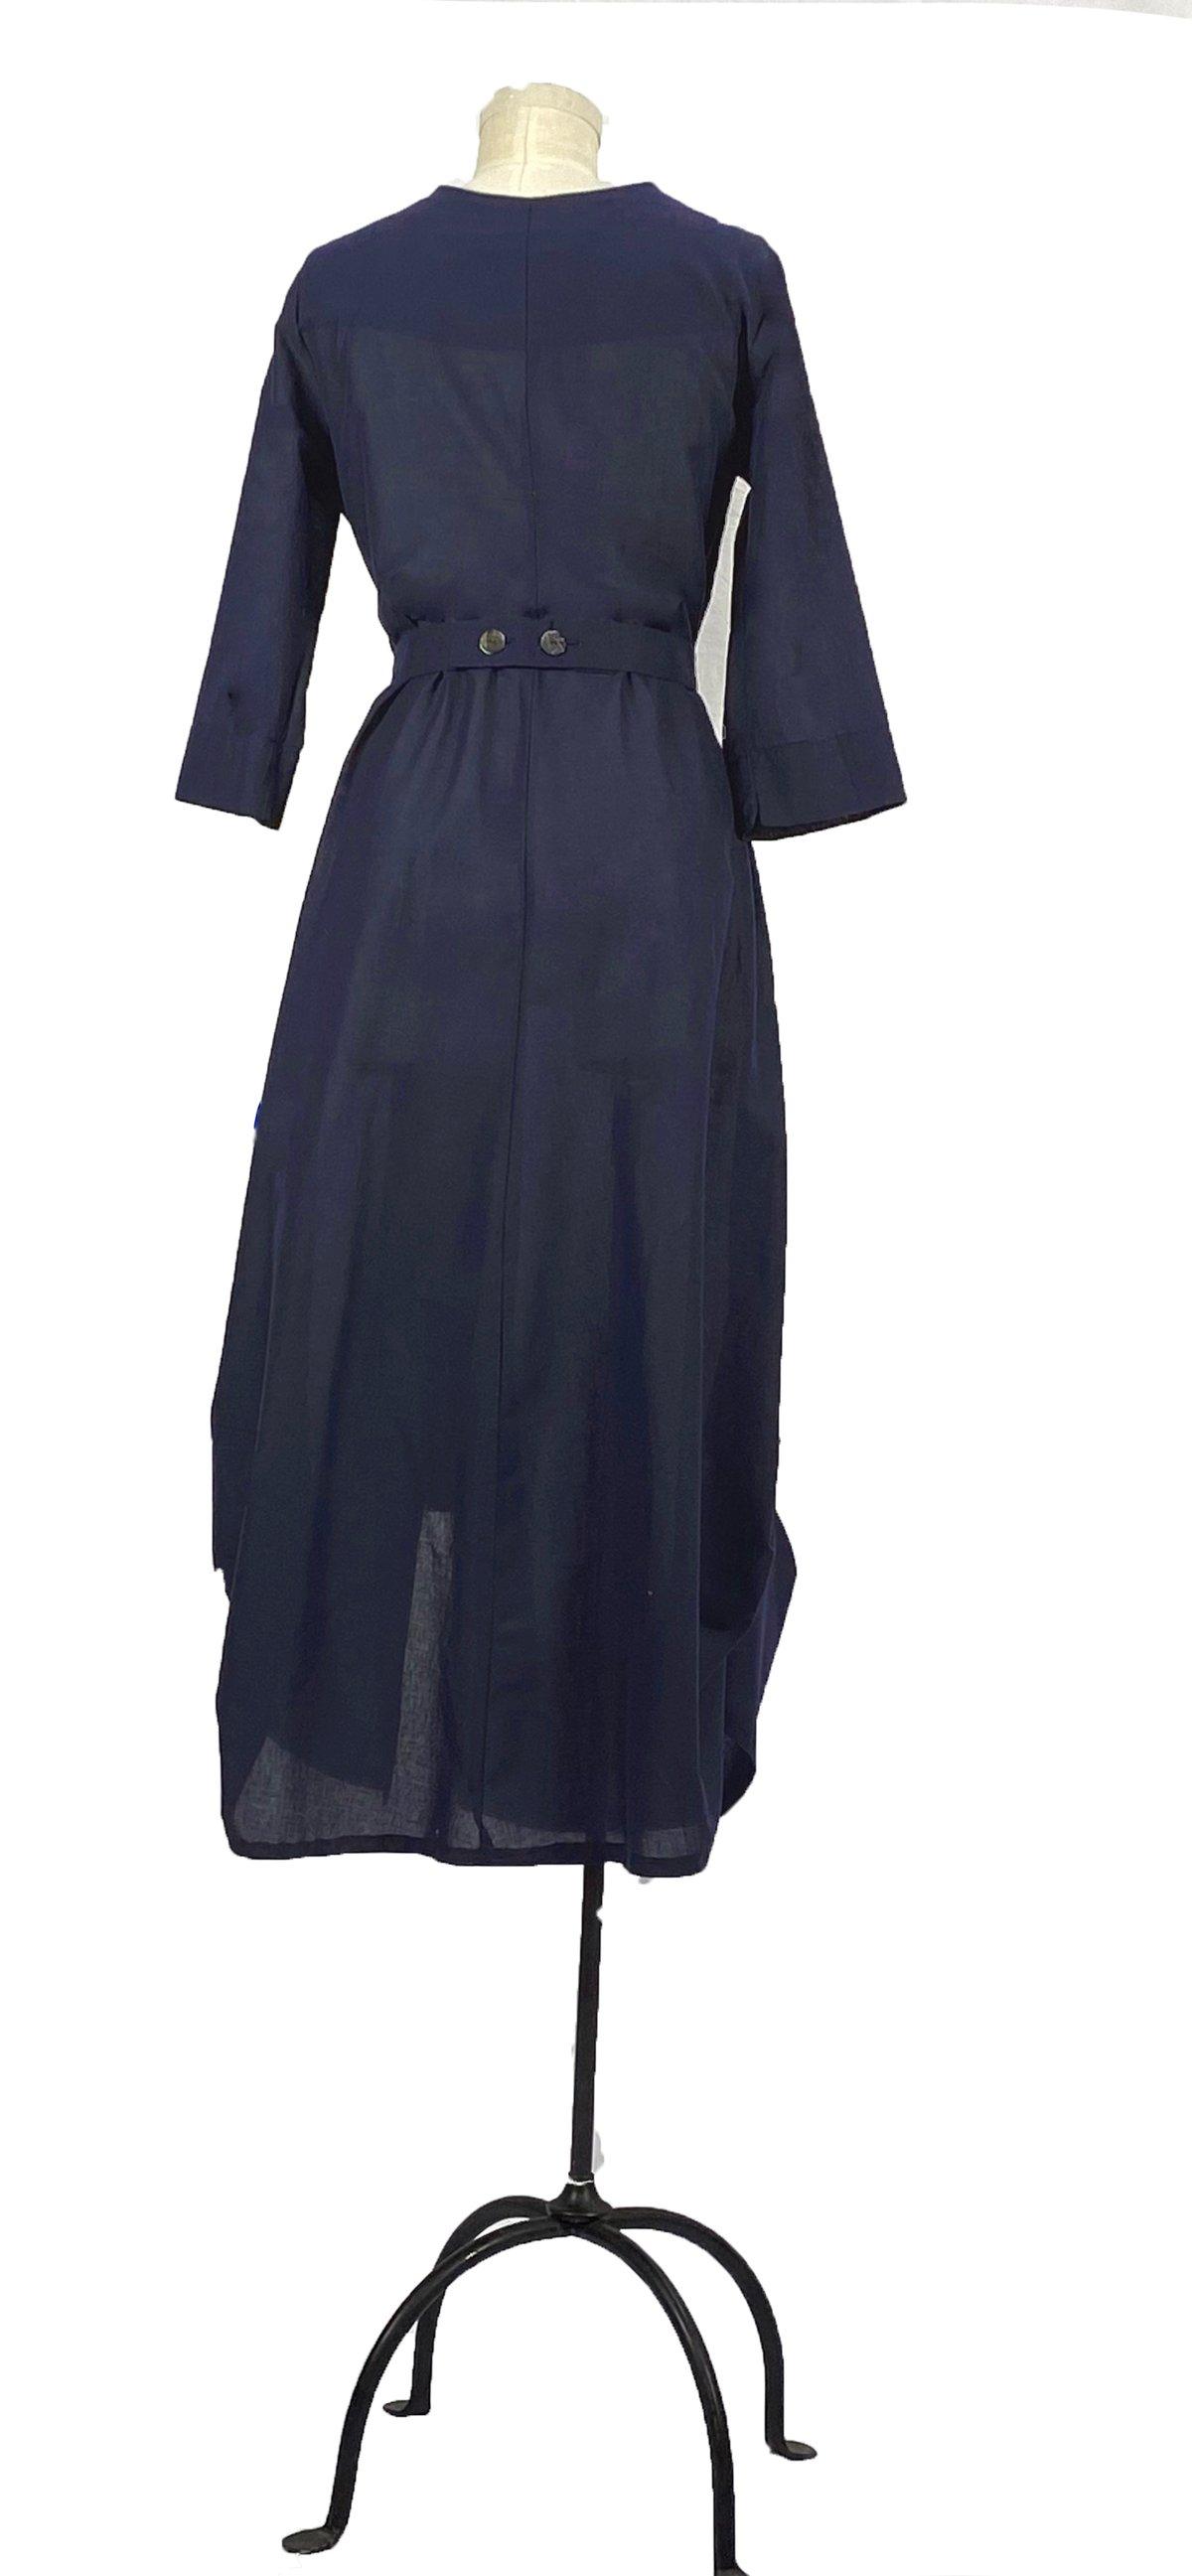 Image of artemisia dress navy